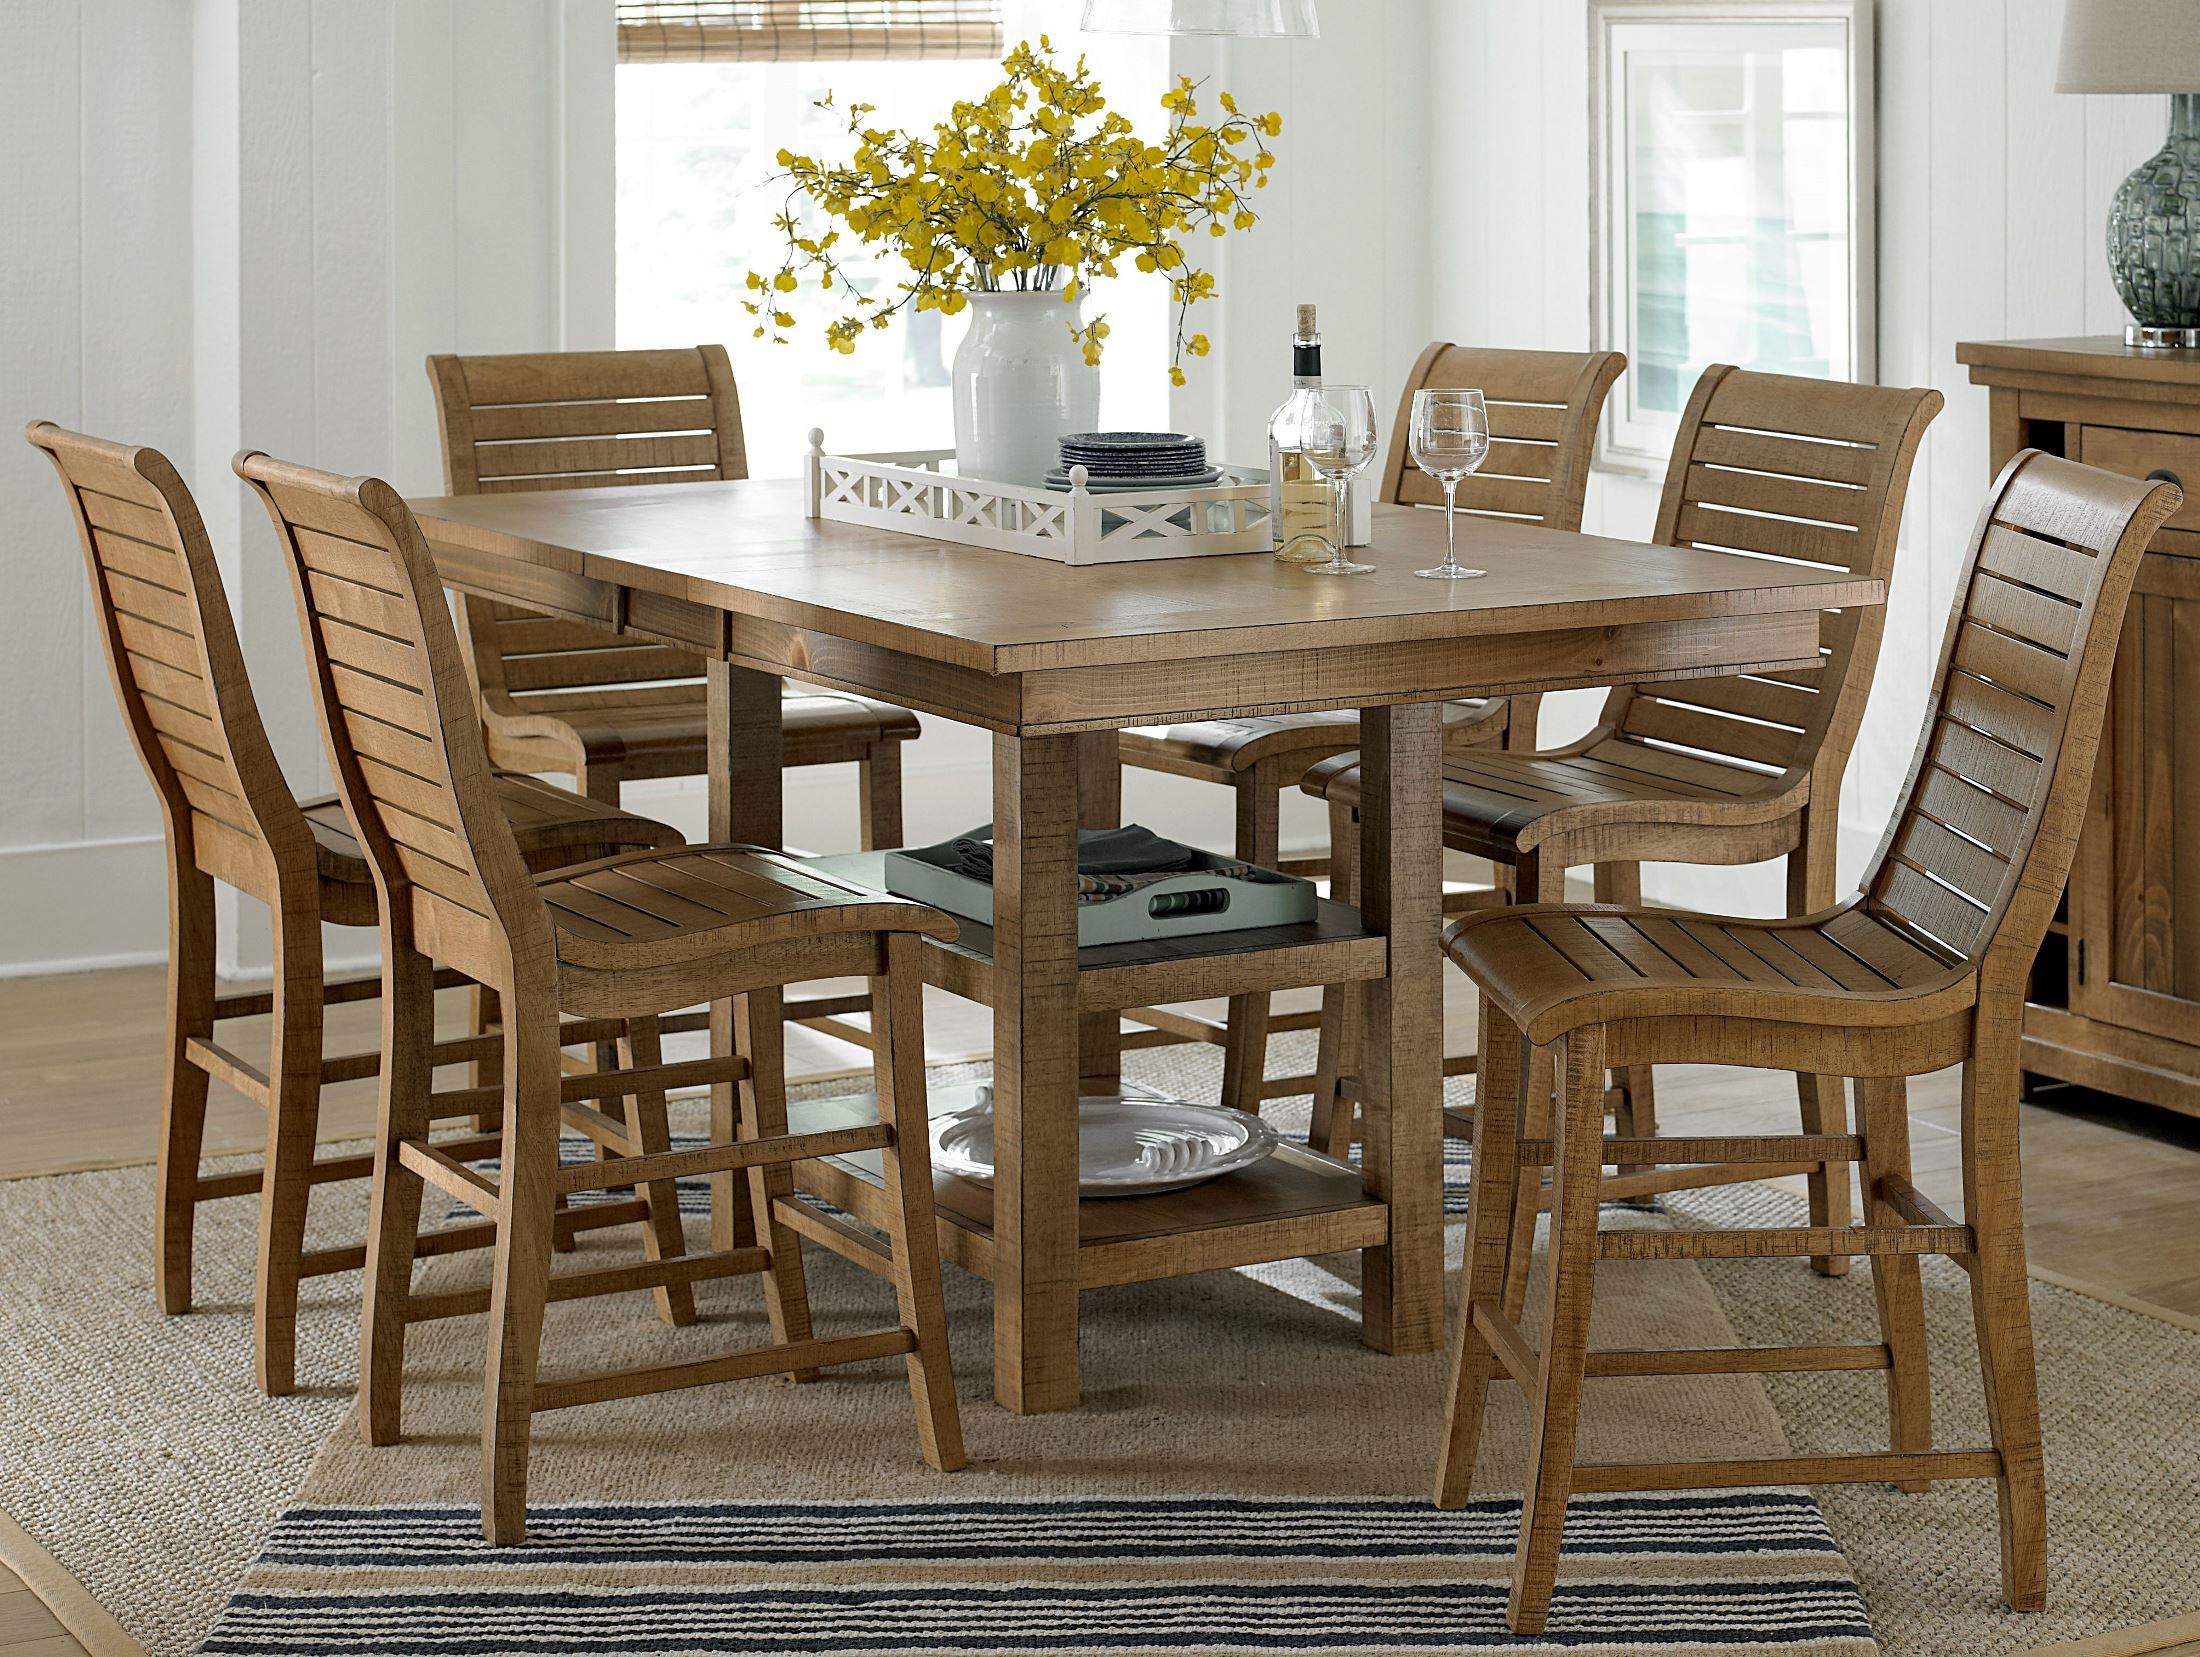 Pine Living Room Furniture Sets: Progressive Furniture Willow Distressed Pine Rectangular